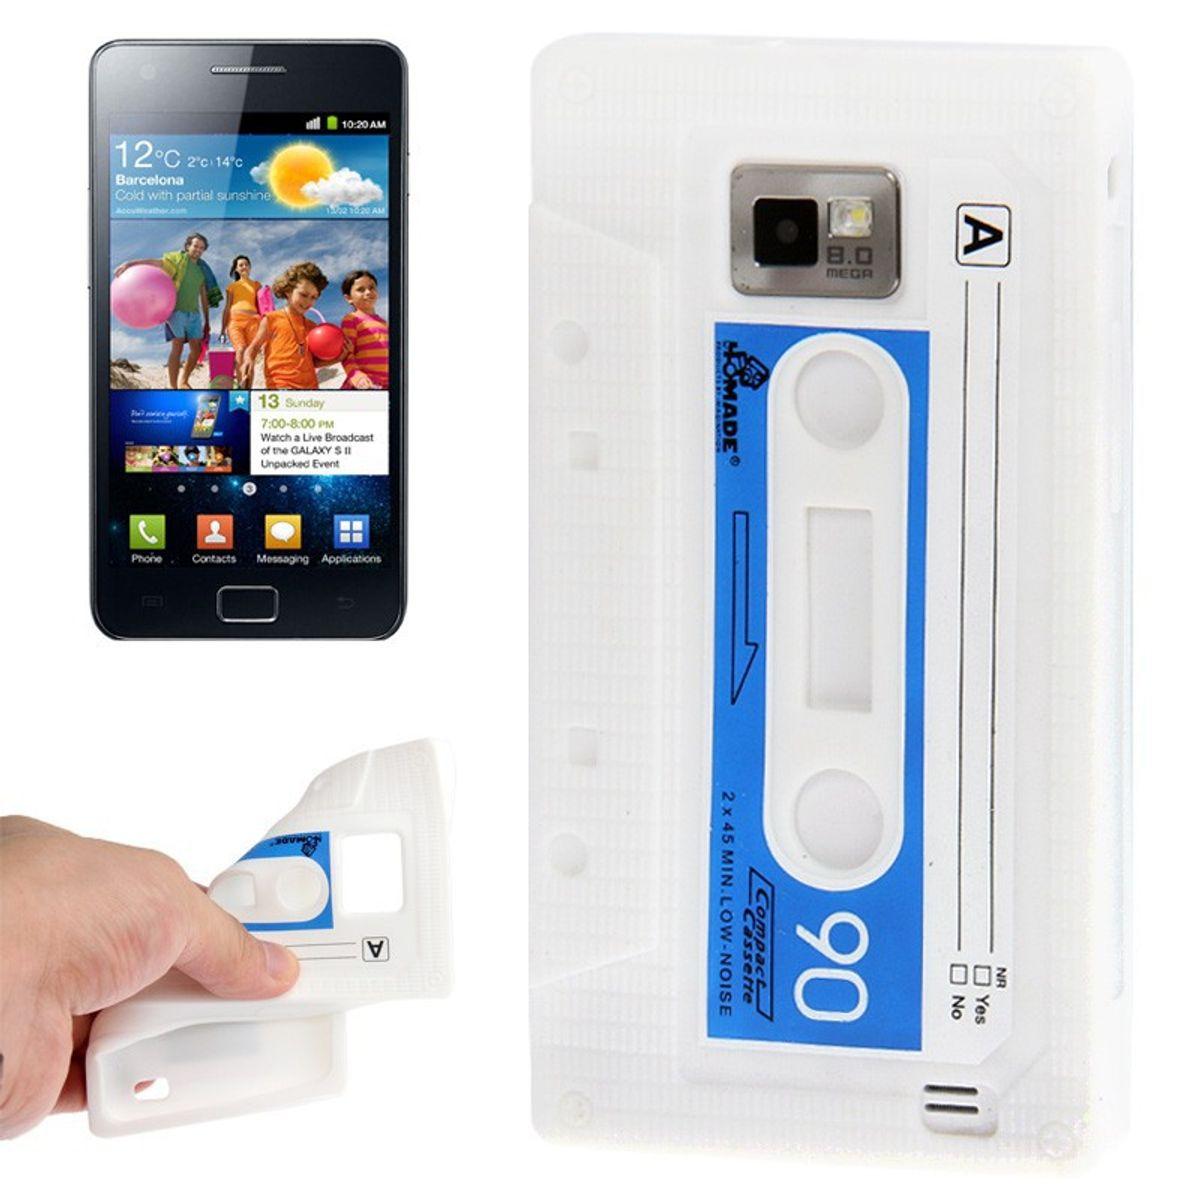 Gameboy Hard Cover + Silikon Kassette Retro für Handy Samsung I9100 Galaxy S2